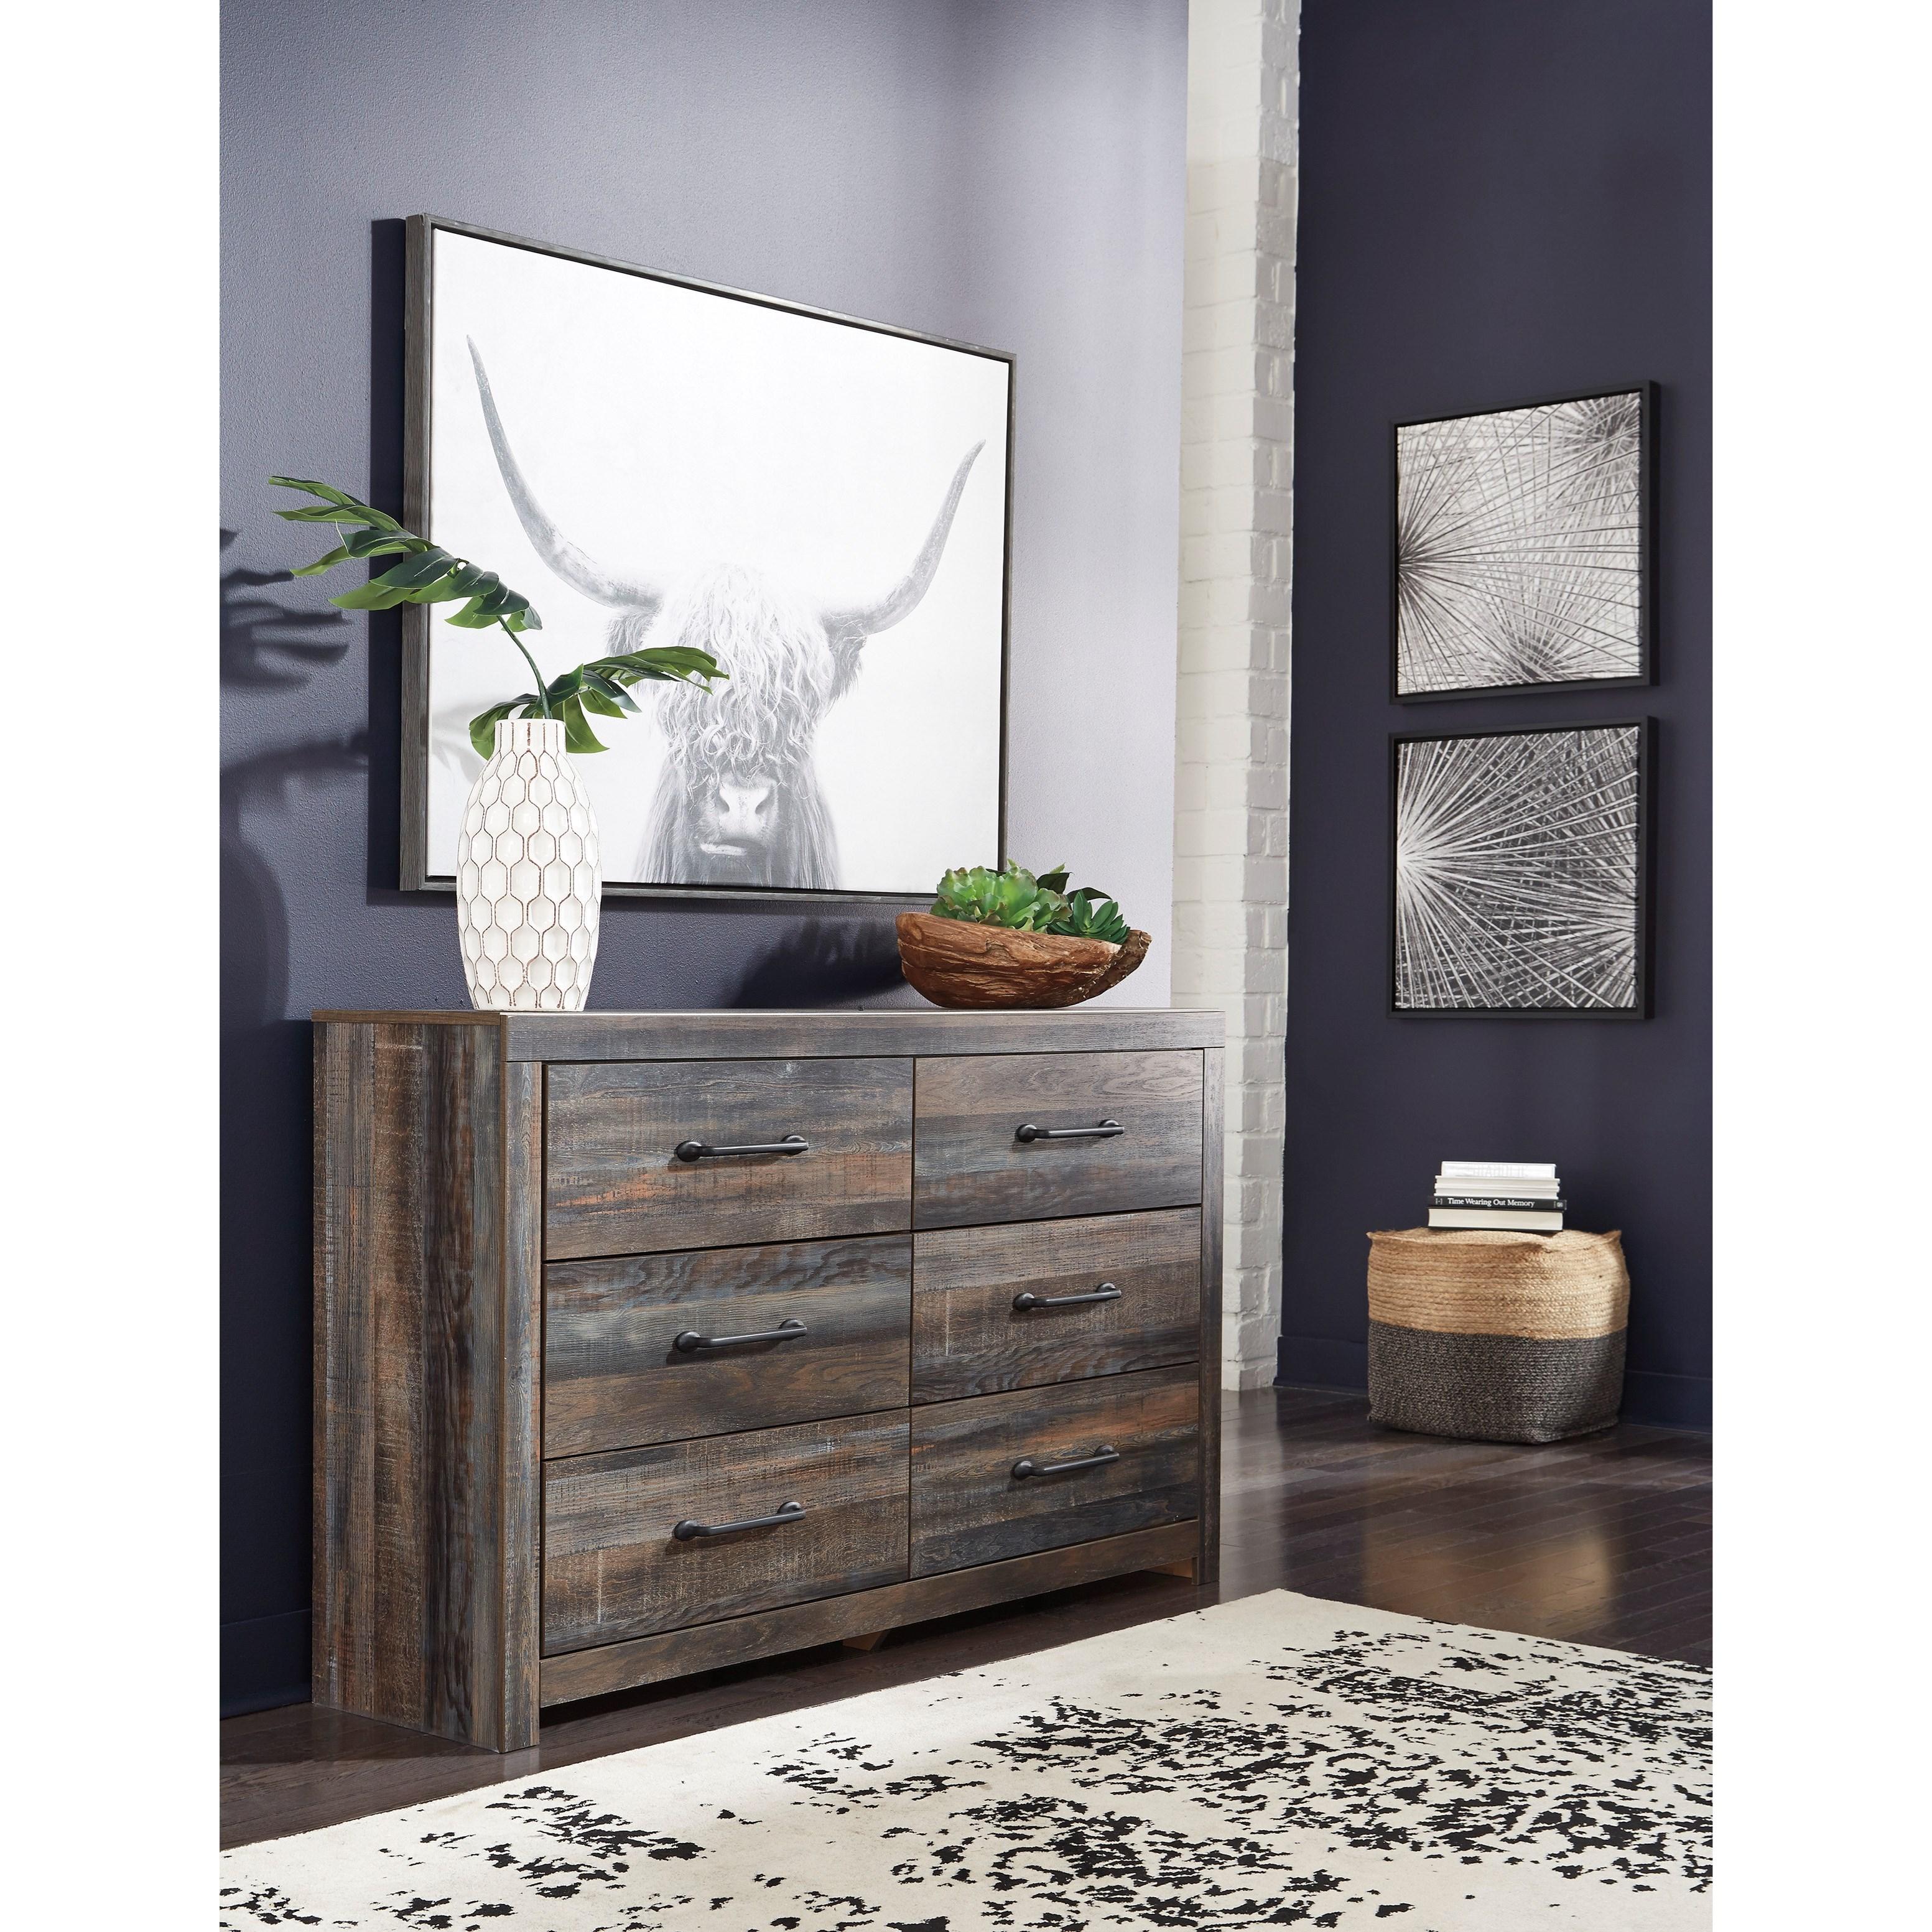 Ashley Furniture In Colorado Springs: Signature Design By Ashley Drystan Rustic 6-Drawer Dresser